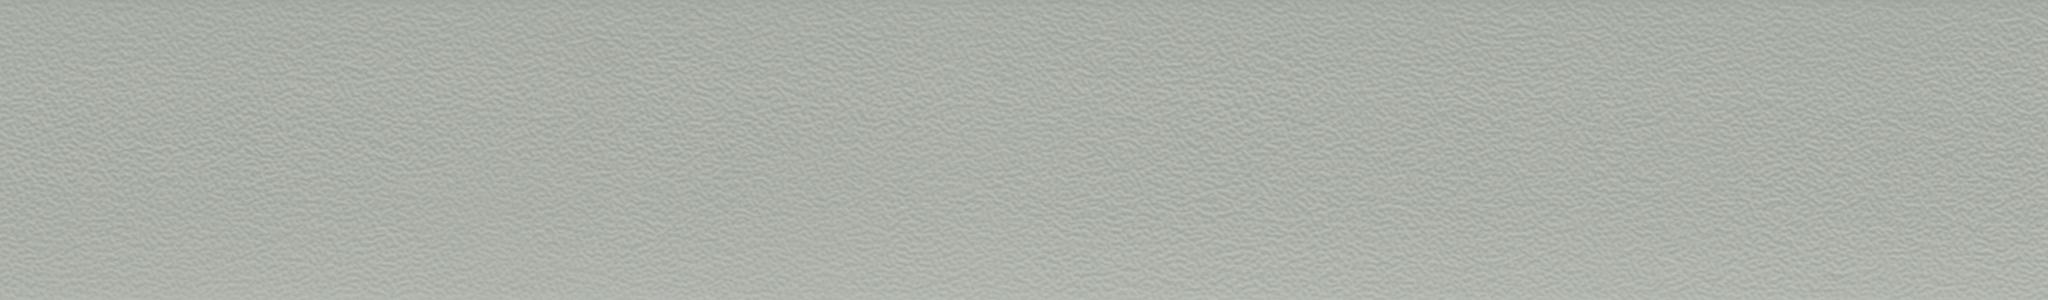 HU 170747 кромка ABS серая жемчуг 101